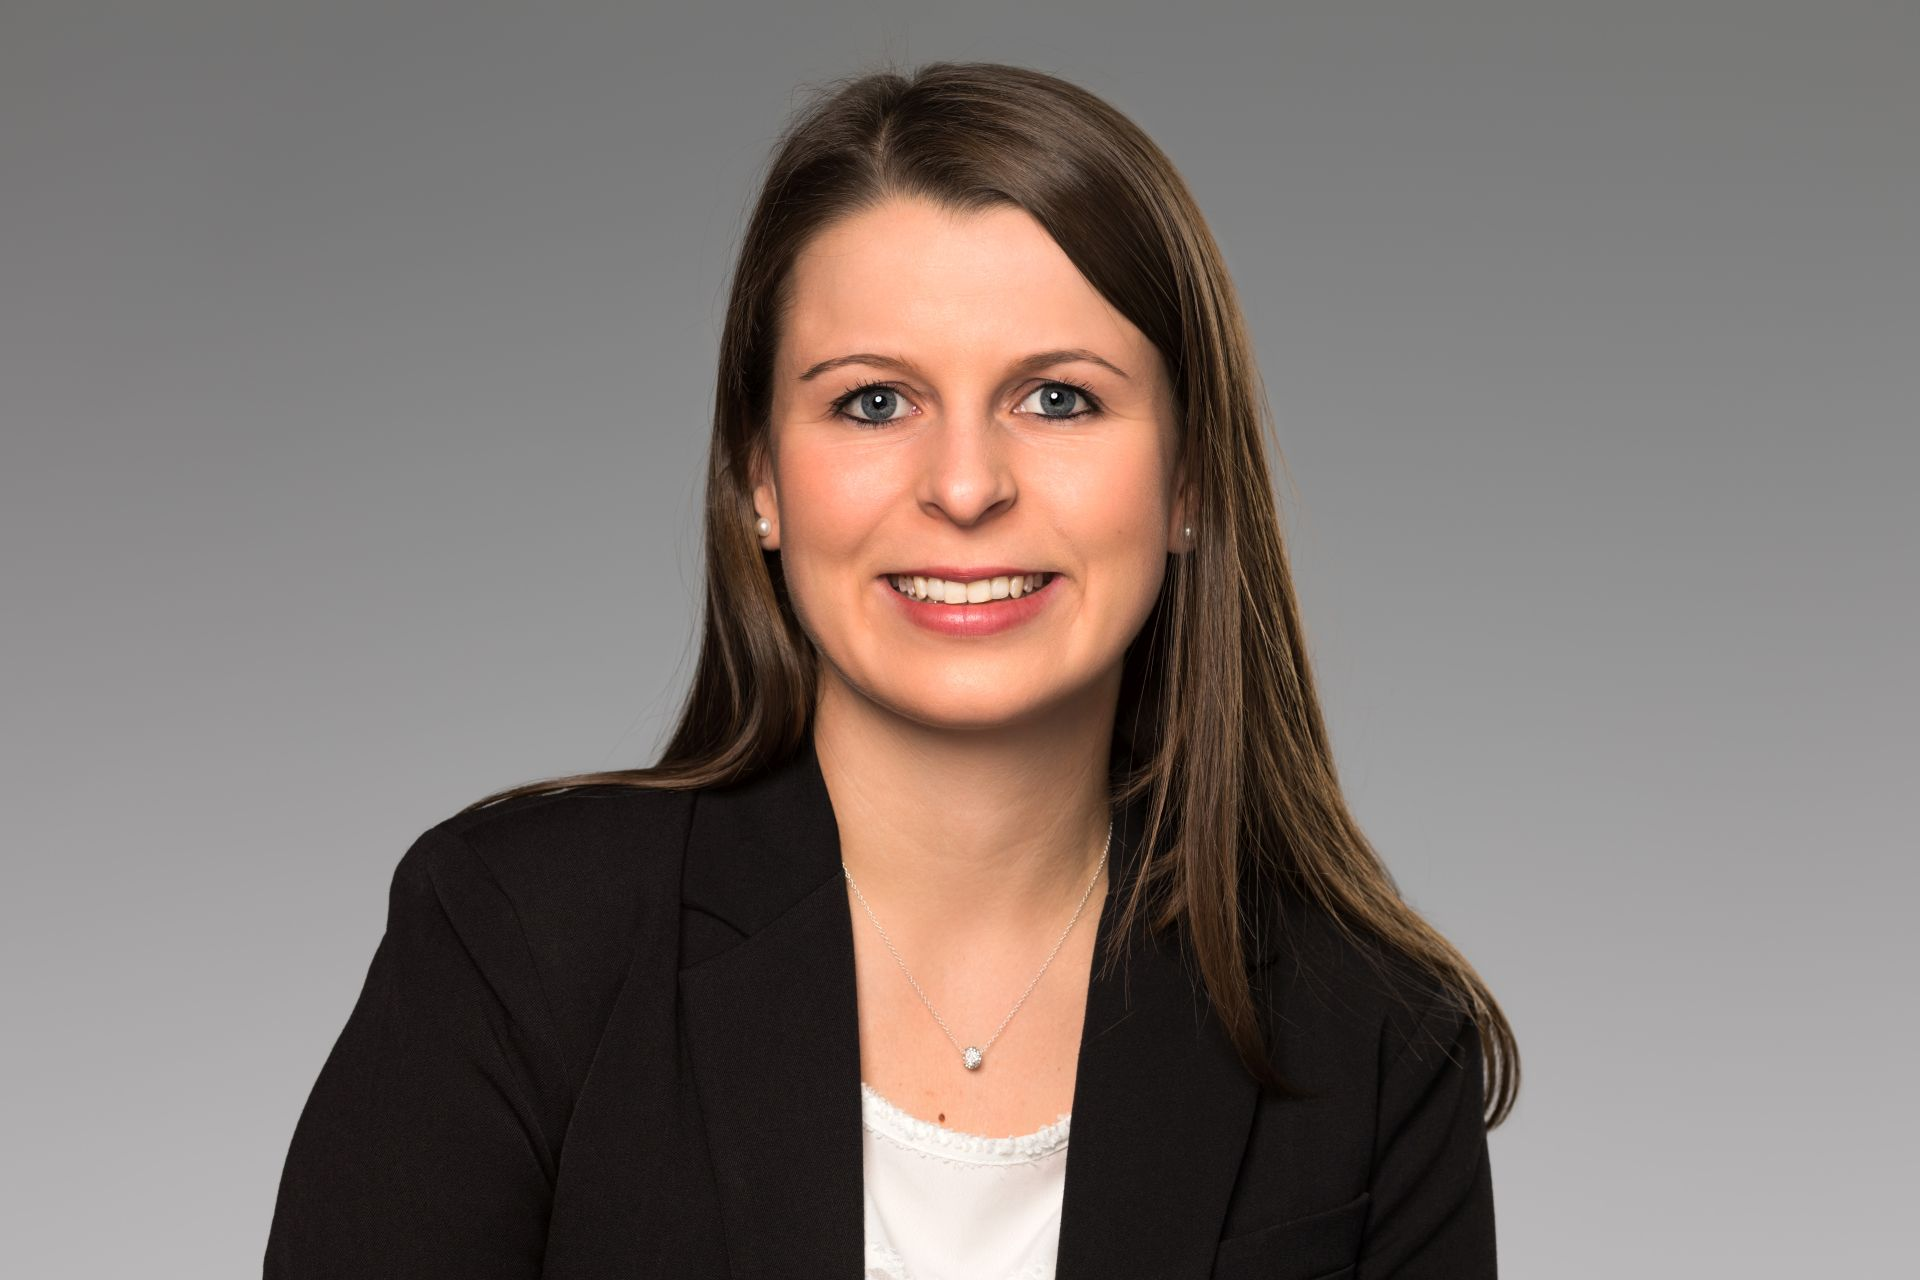 Isabell Benzinger